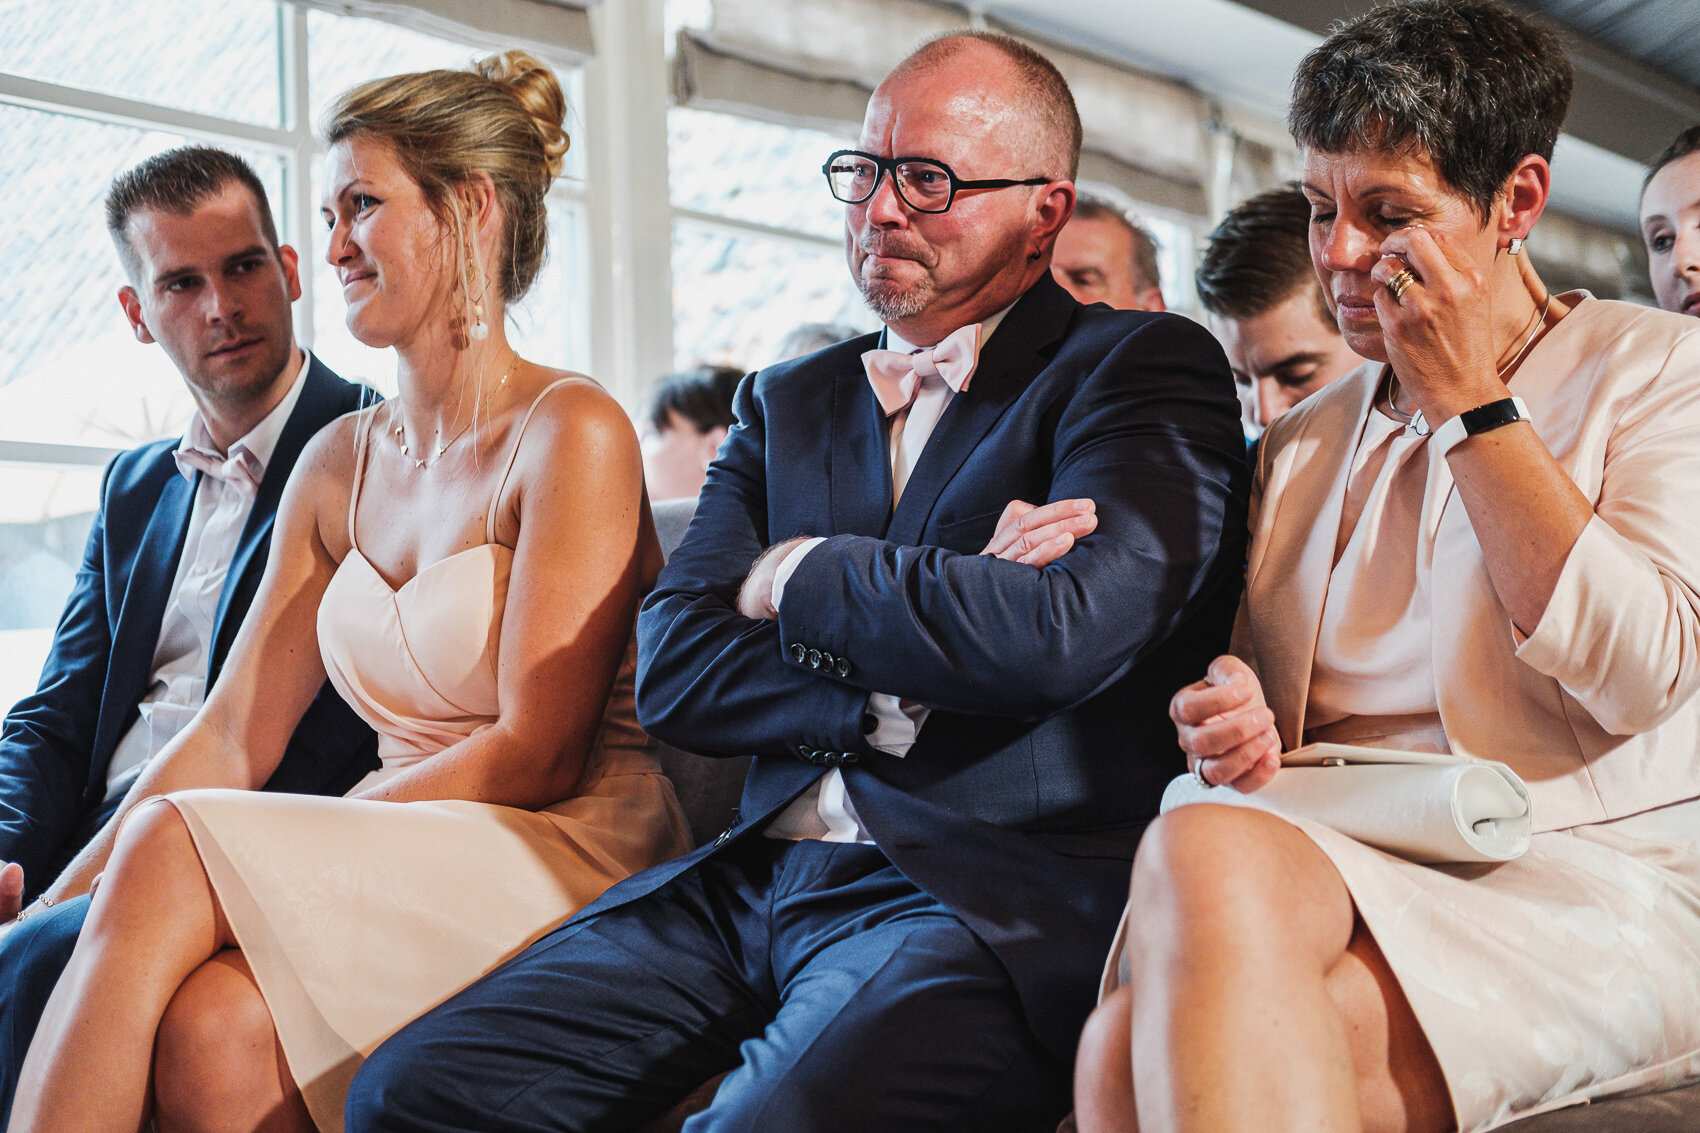 iso800 - huwelijksfotograaf isabo matthias verbeke foundation-25.jpg